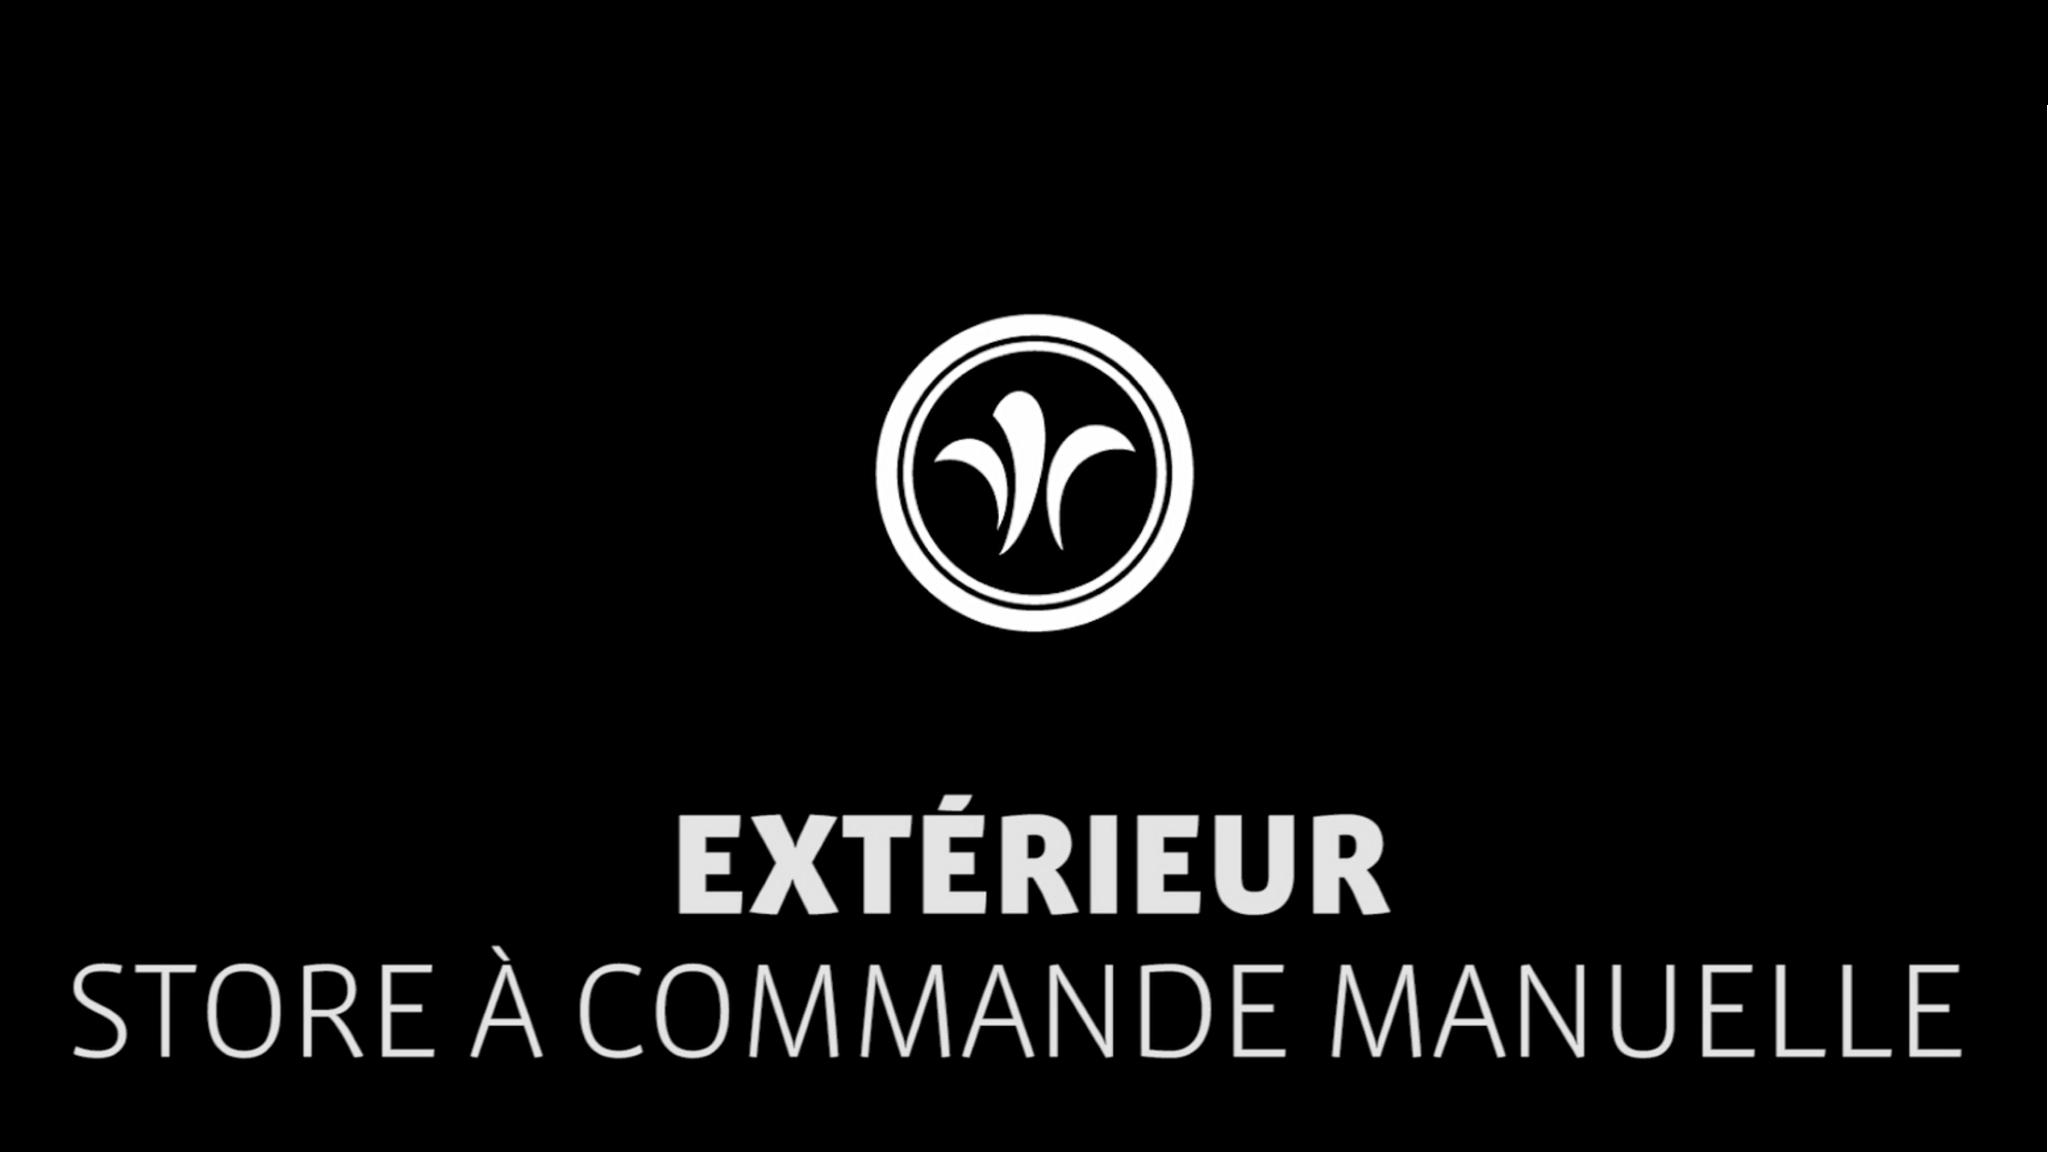 Auvent manuel pour camping-car // Niesmann+Bischoff - Camping-car de luxe (FLAIR) // 2019 // EX6